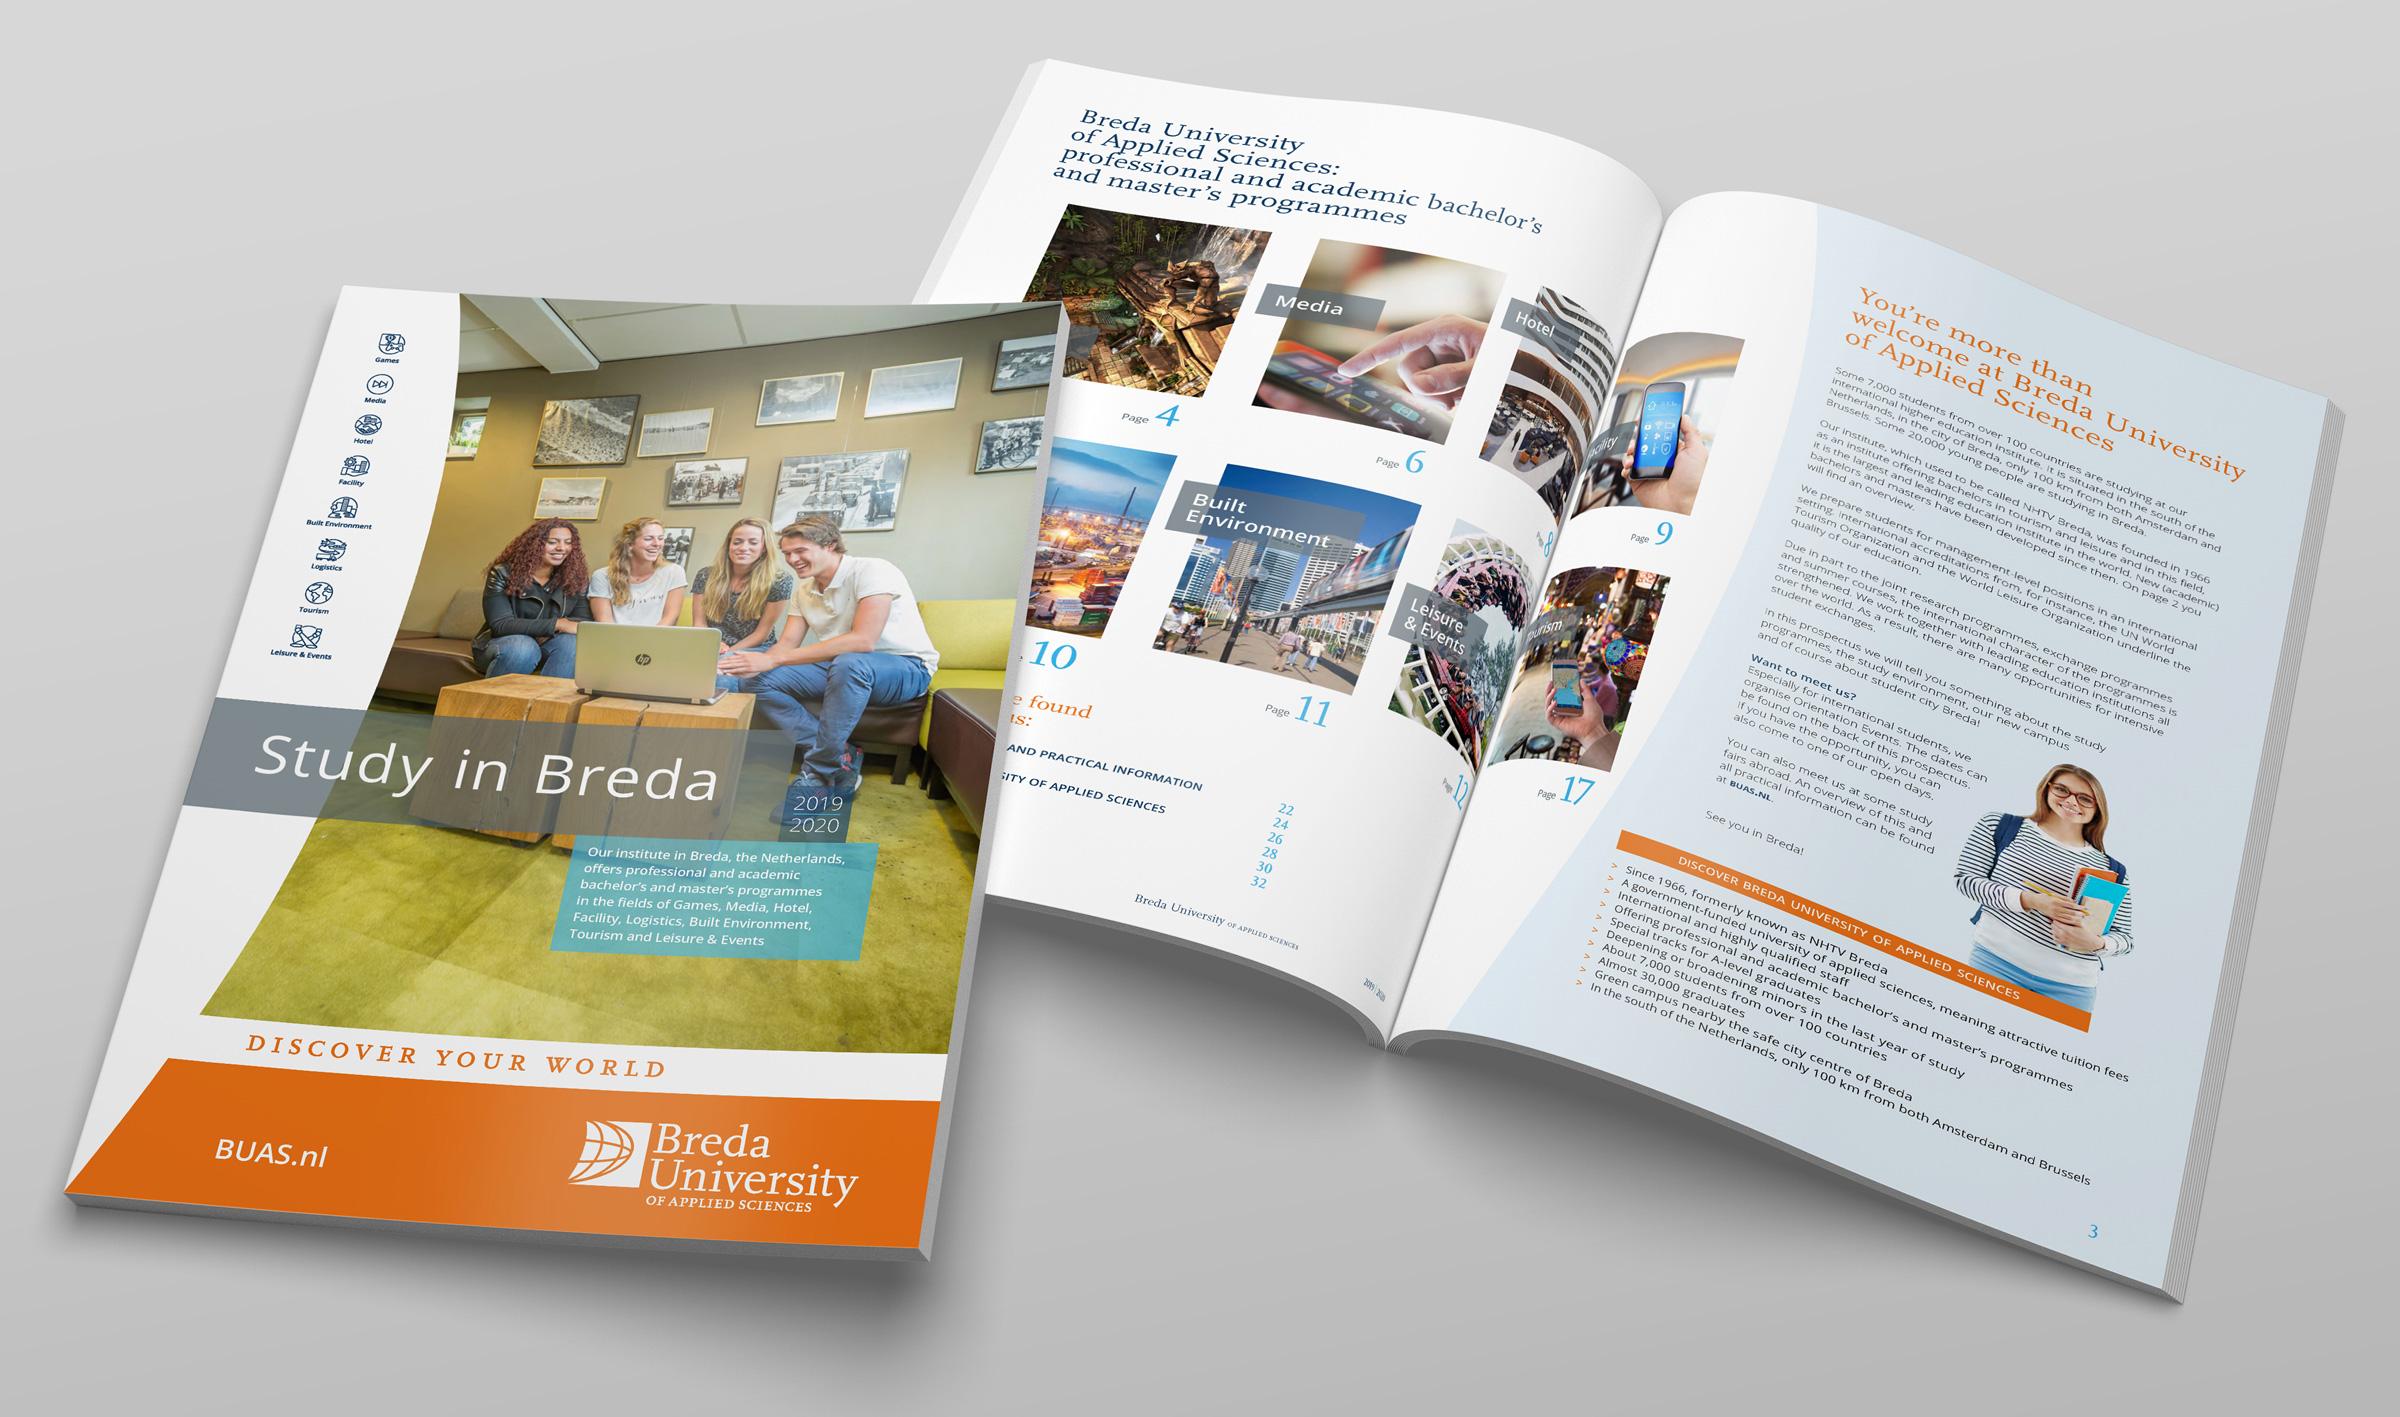 20181210-Reach-Breda-University-Study-Guide-150